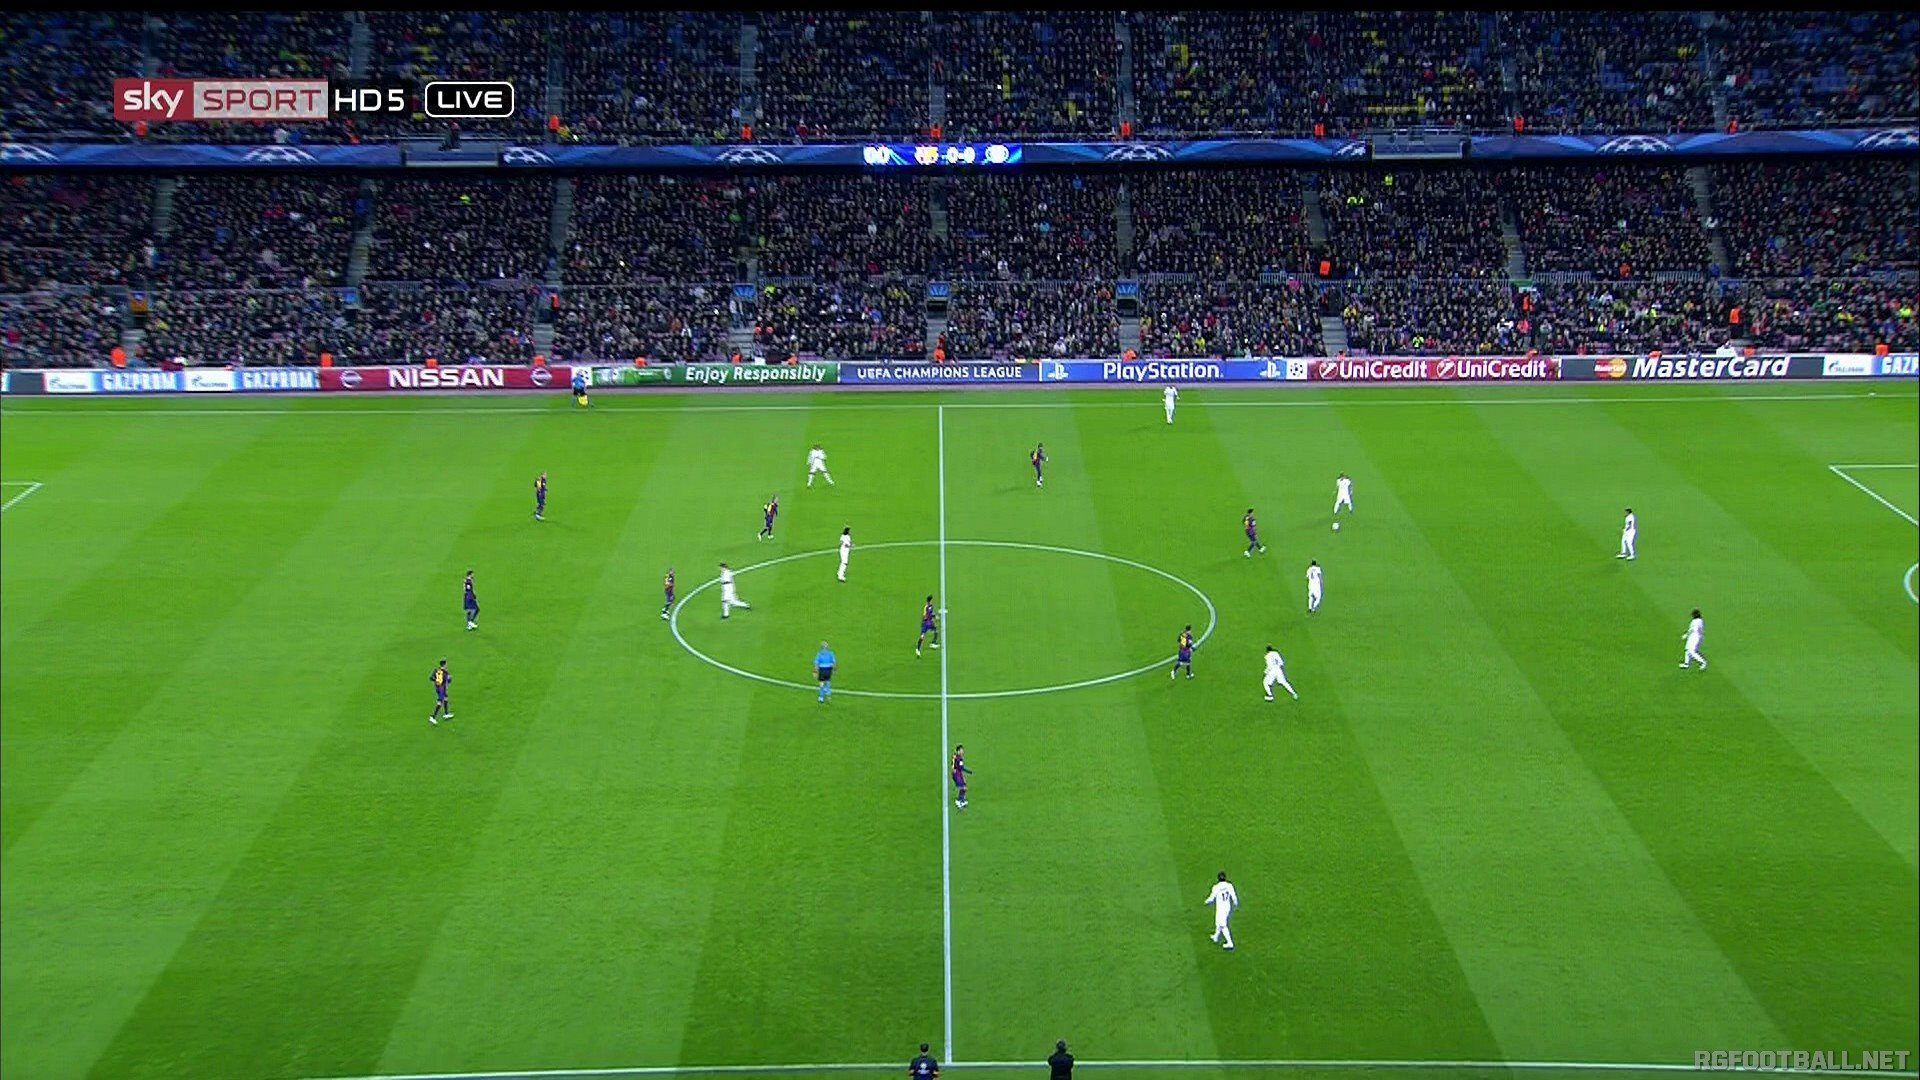 Camp nou, barcelona , spain more details: series 0 - 0.